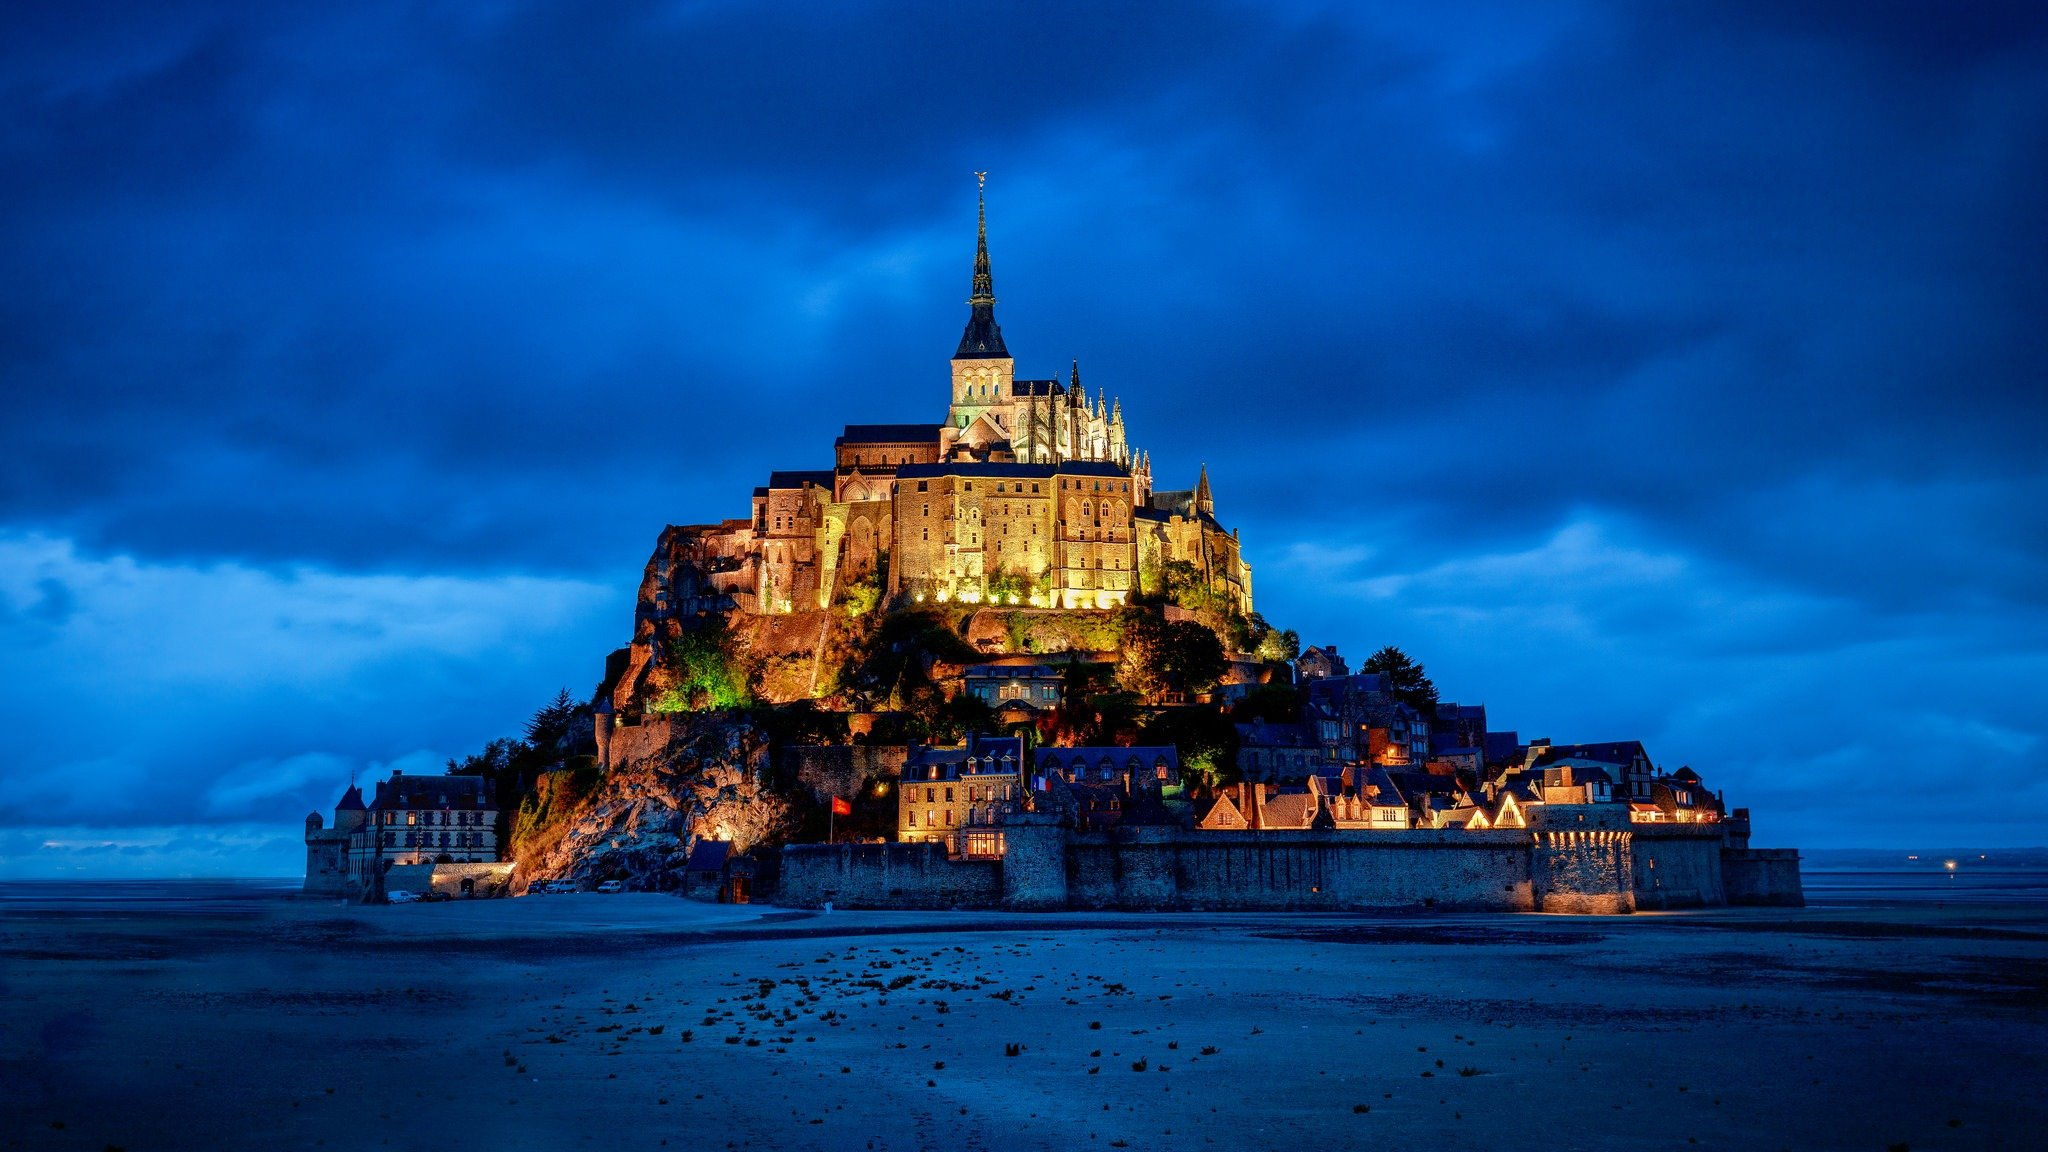 Best Mont Saint Michel Wallpaper Id483720 For High